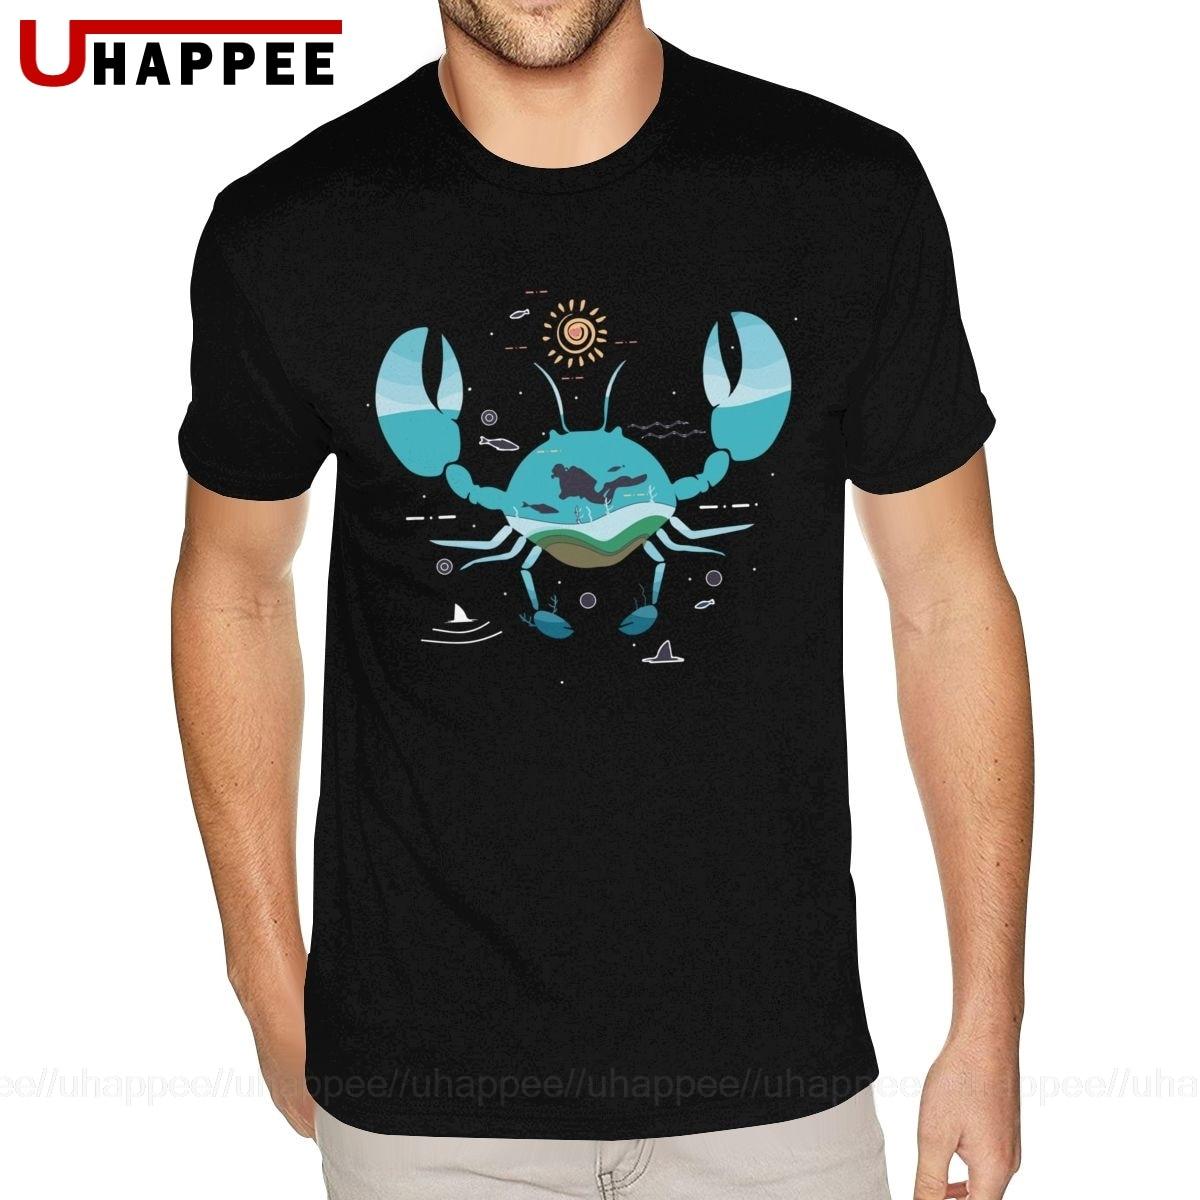 Big Tall Crab Tees Men S Grunge Fashion Designers Short Sleeves Men Summer T Shirts 1990s Clothing T Shirts Aliexpress